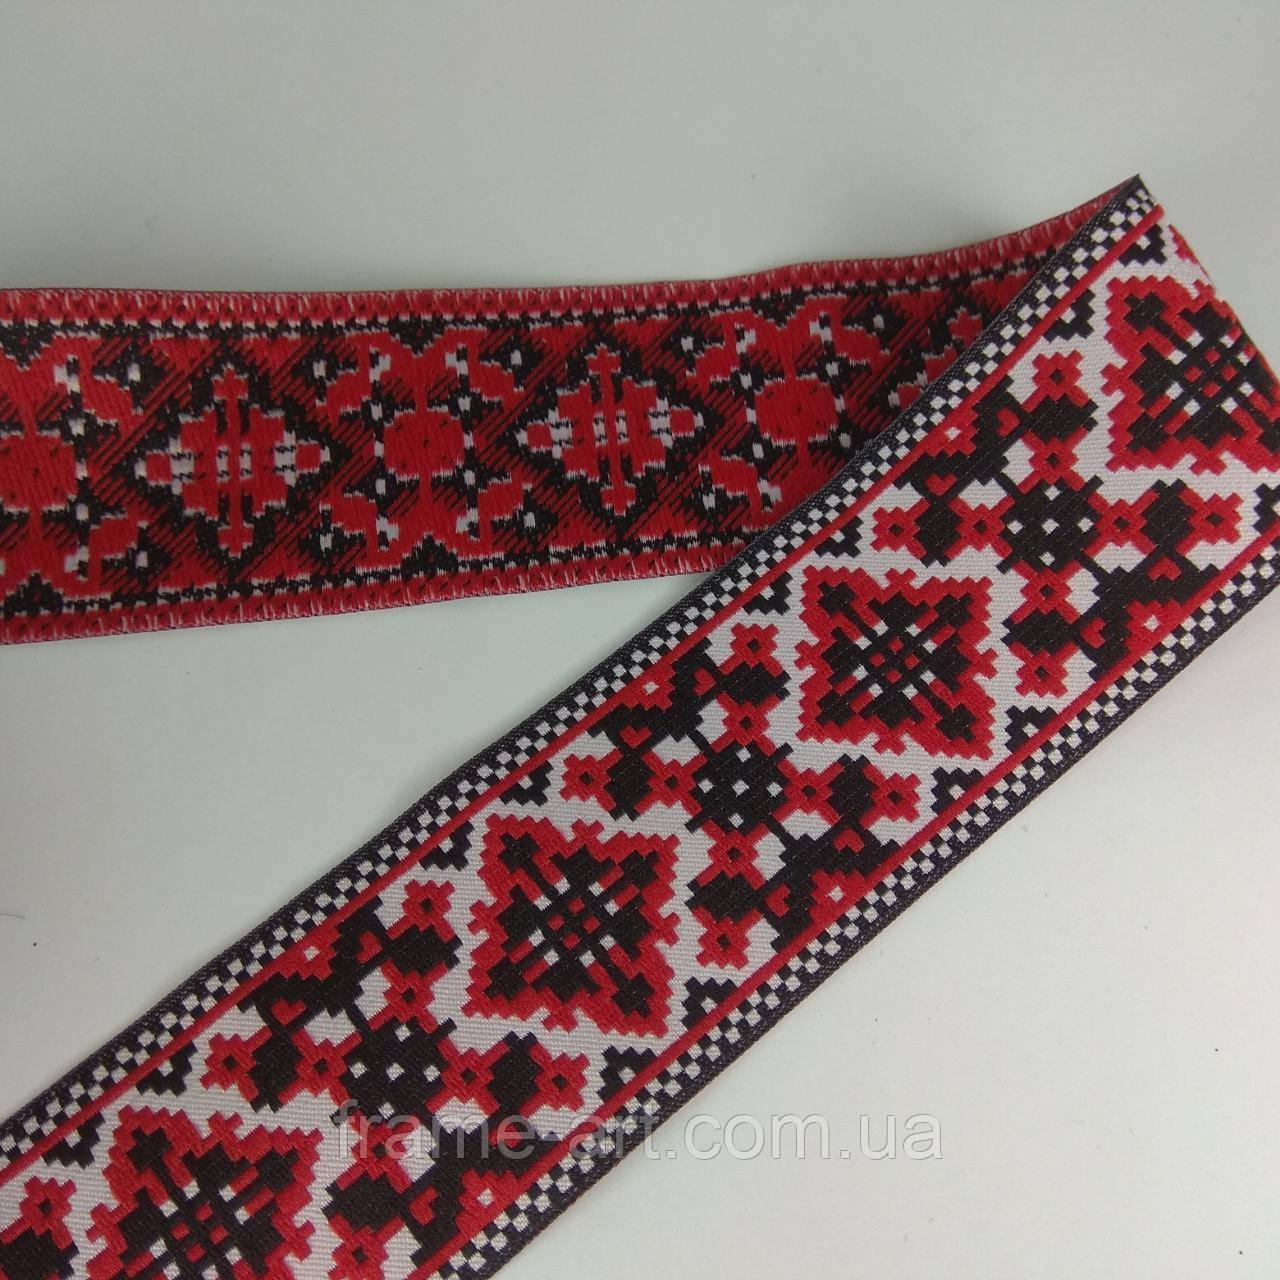 Прошва Украинская вышивка №26 50мм красная